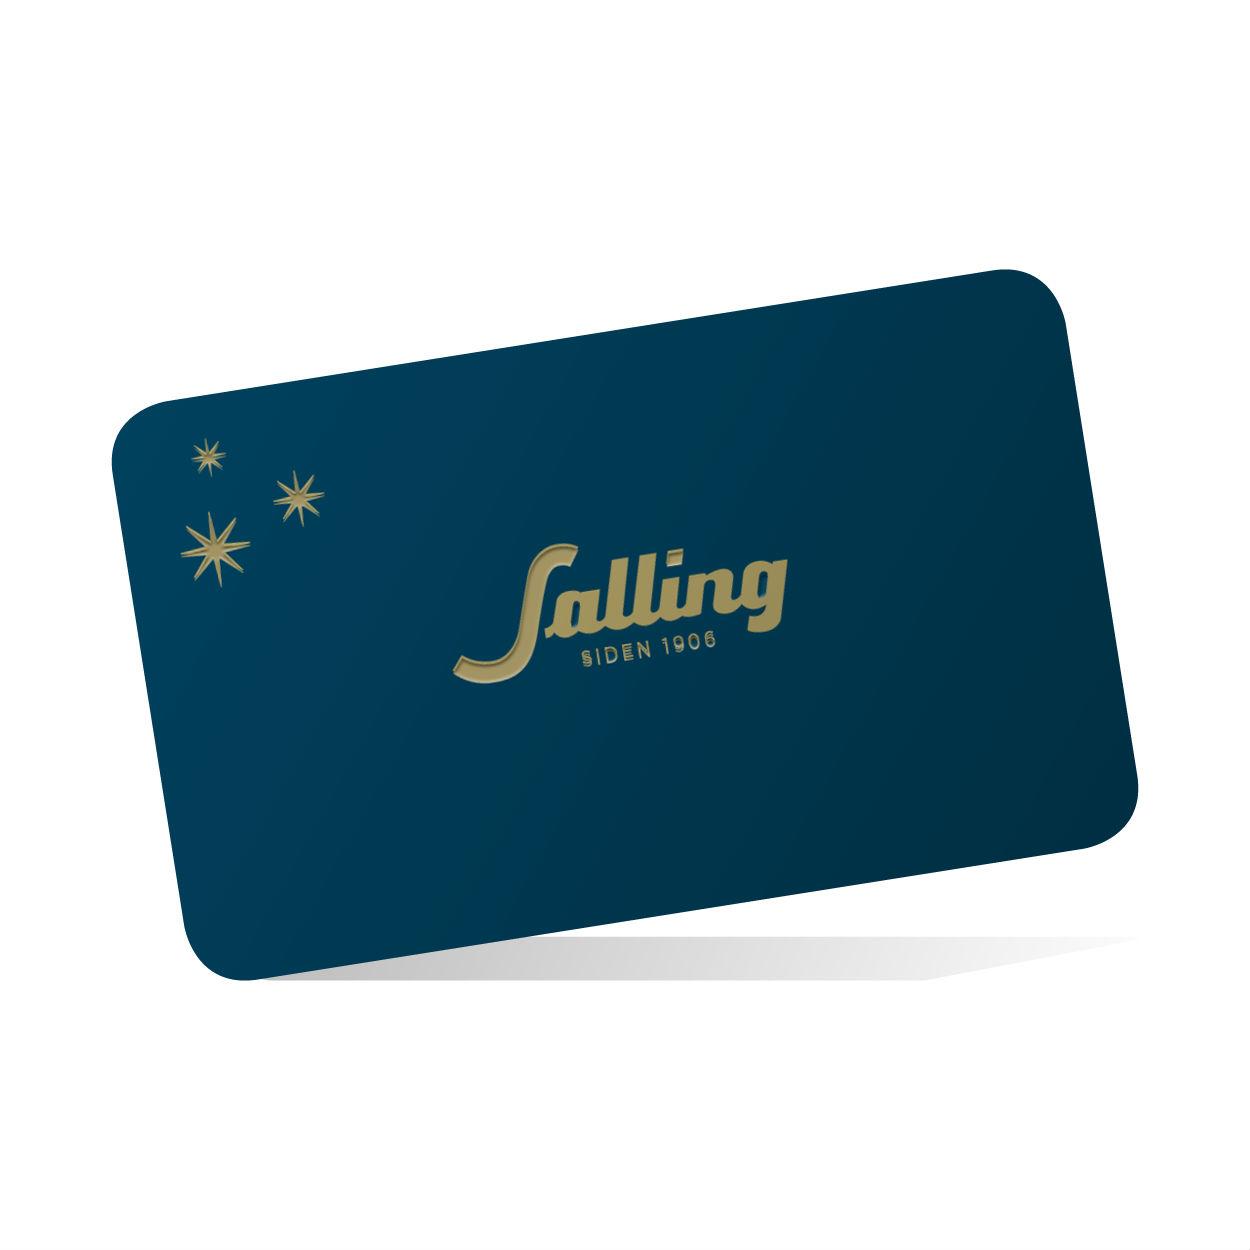 Salling gavekort - 1100 kr